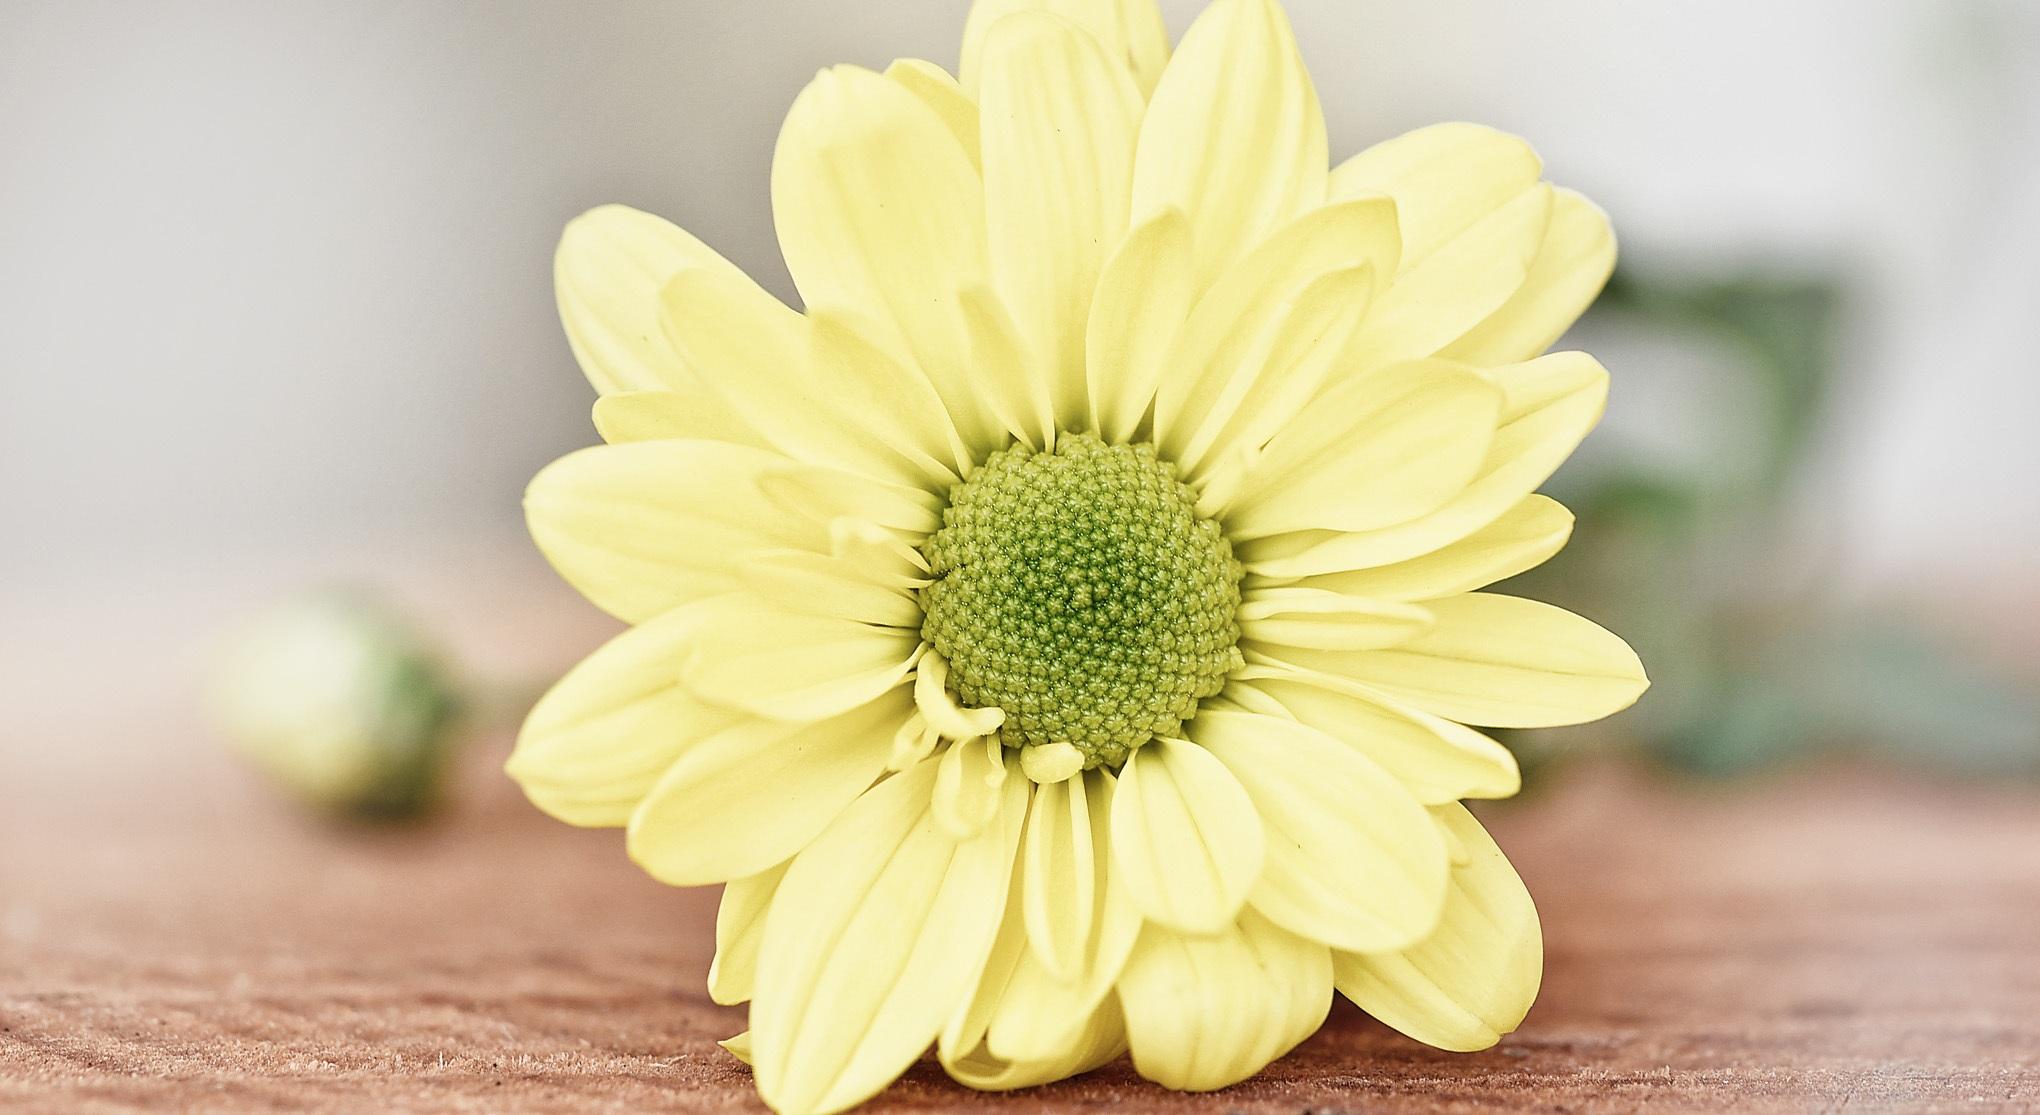 Free Images Petal Yellow Flower Flowers Close Up Gerbera